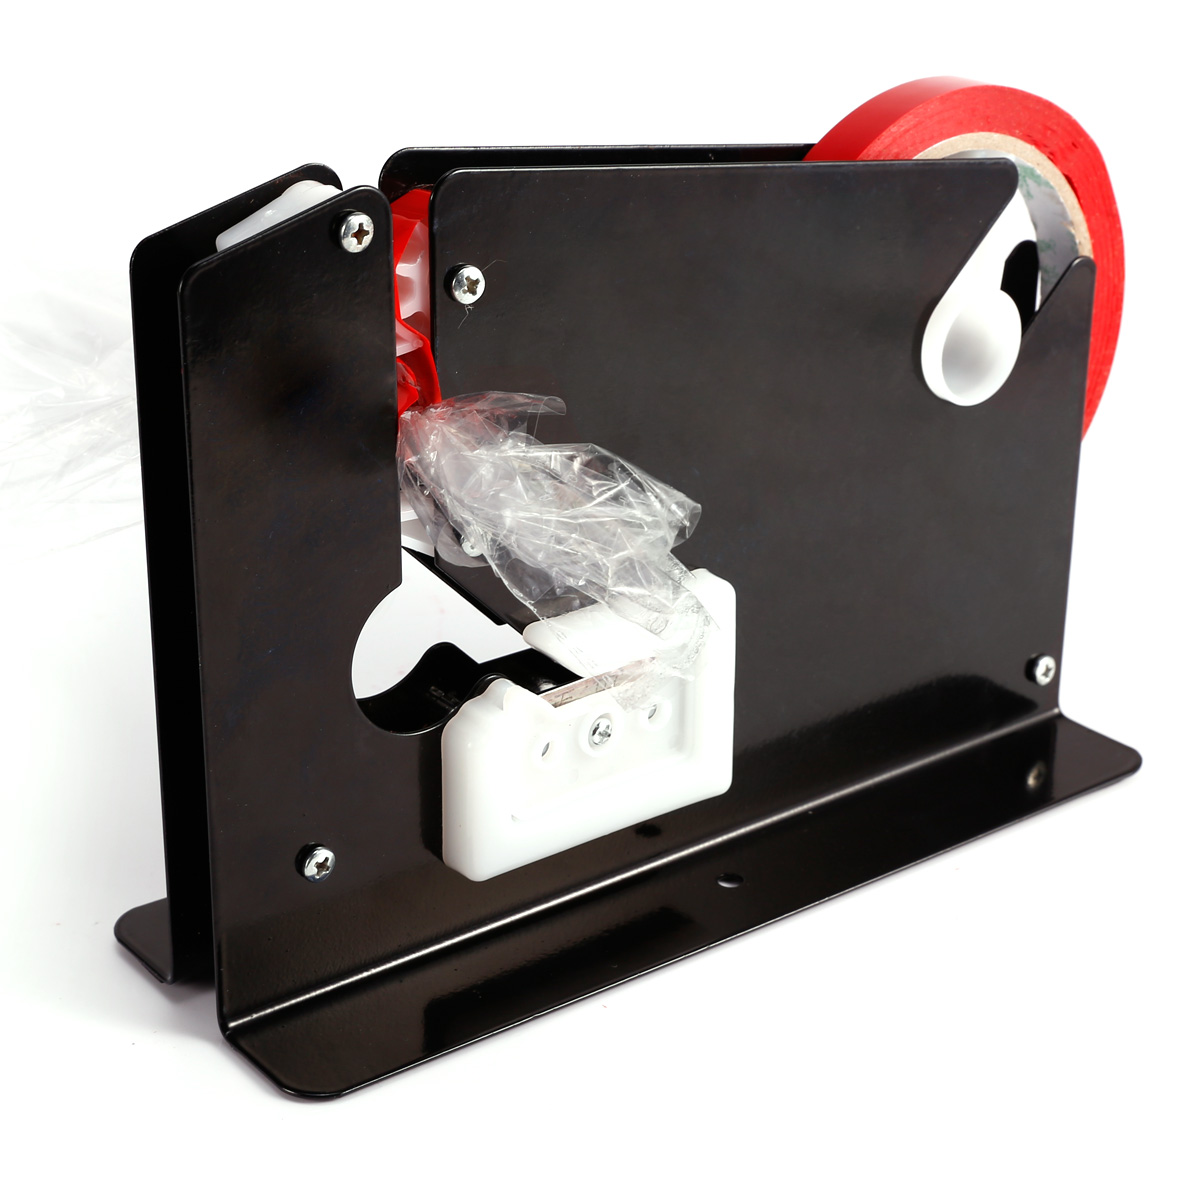 beutelschlie er 6 rollen klebeband beutelschlie ger t t ten verschluss ebay. Black Bedroom Furniture Sets. Home Design Ideas